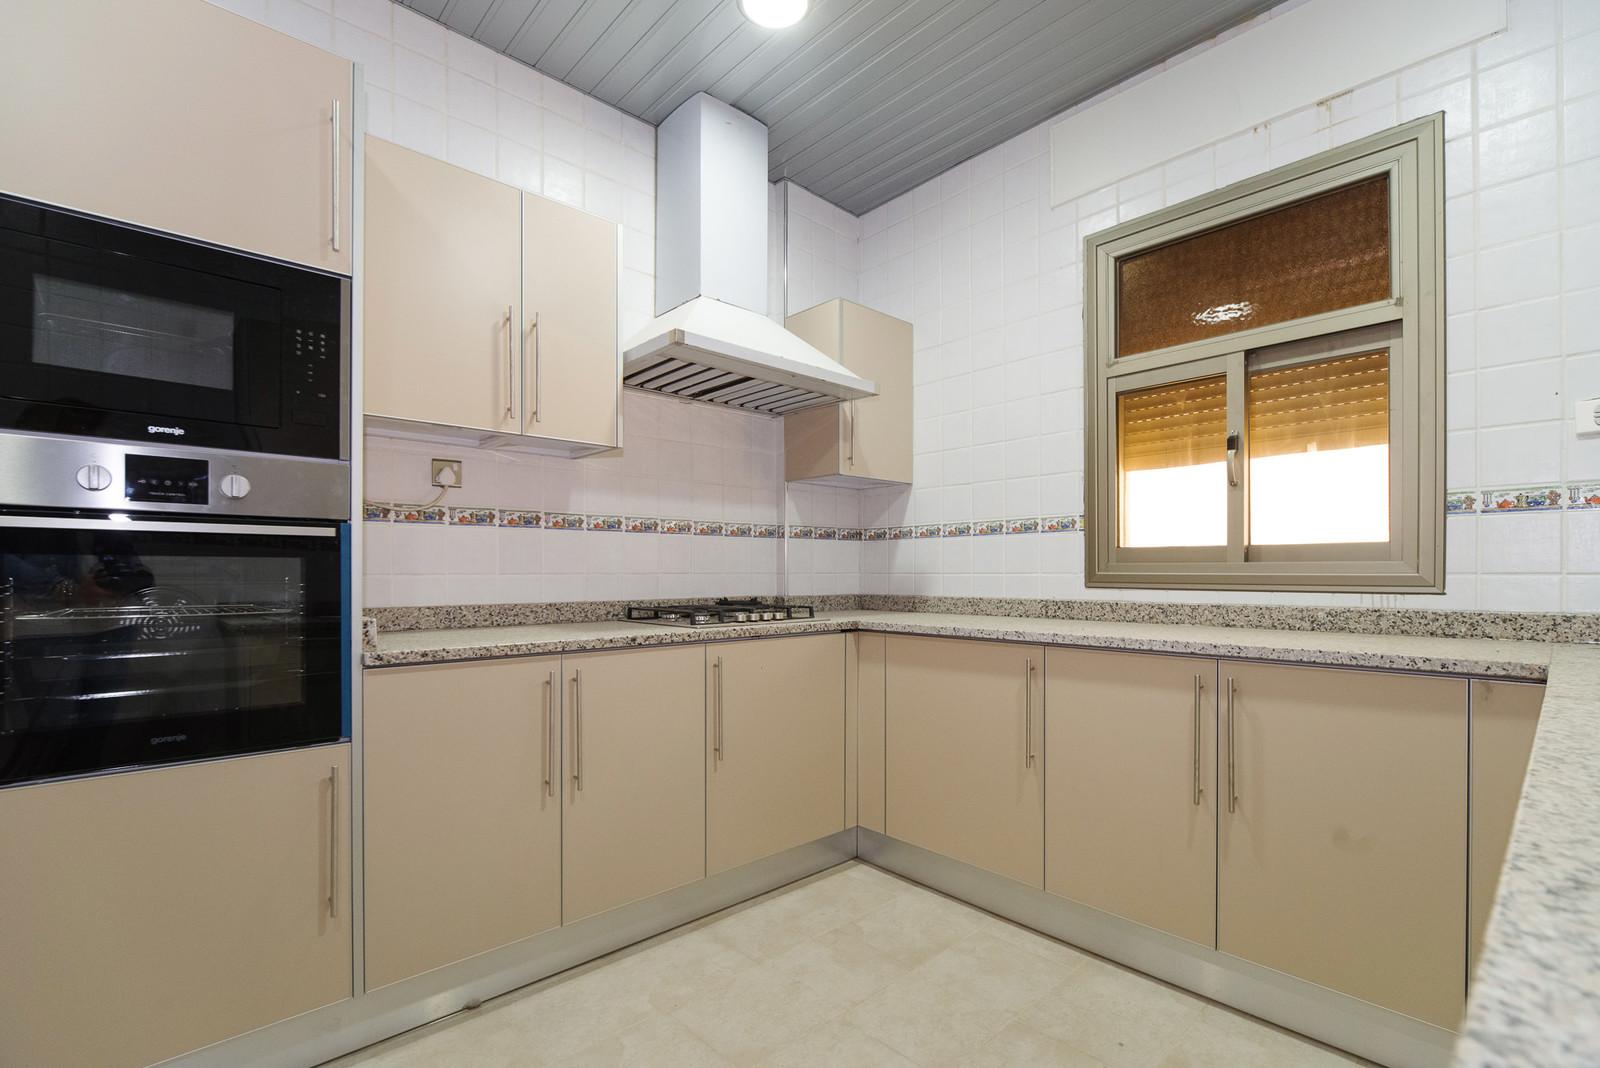 Siddeeq – very nice unfurnished, three bedroom apartments